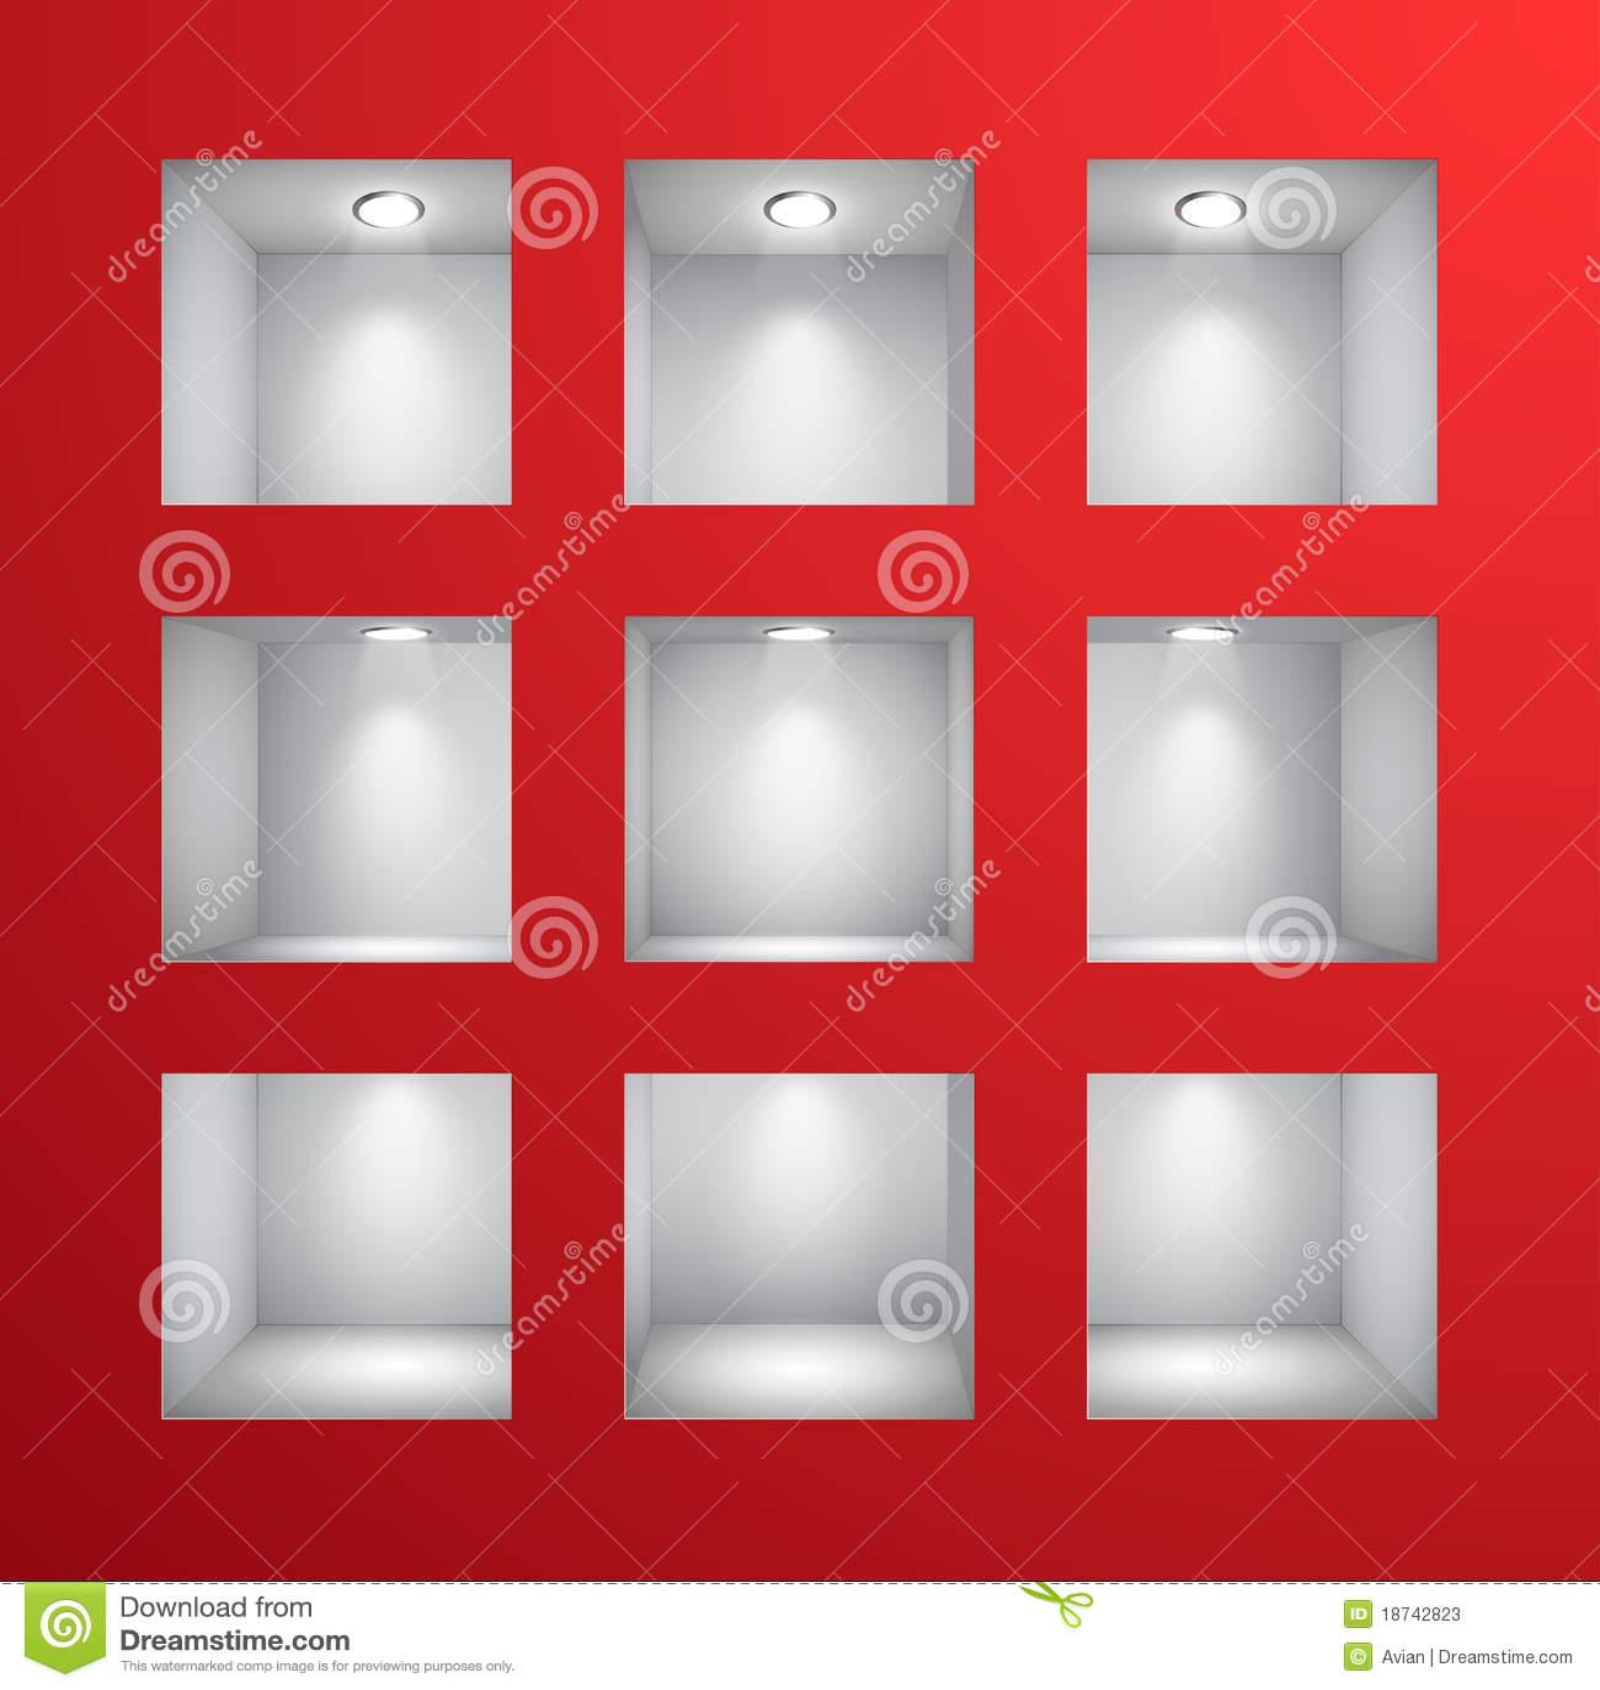 3d leeren regale f r ausstellung in der wand stockfotos. Black Bedroom Furniture Sets. Home Design Ideas